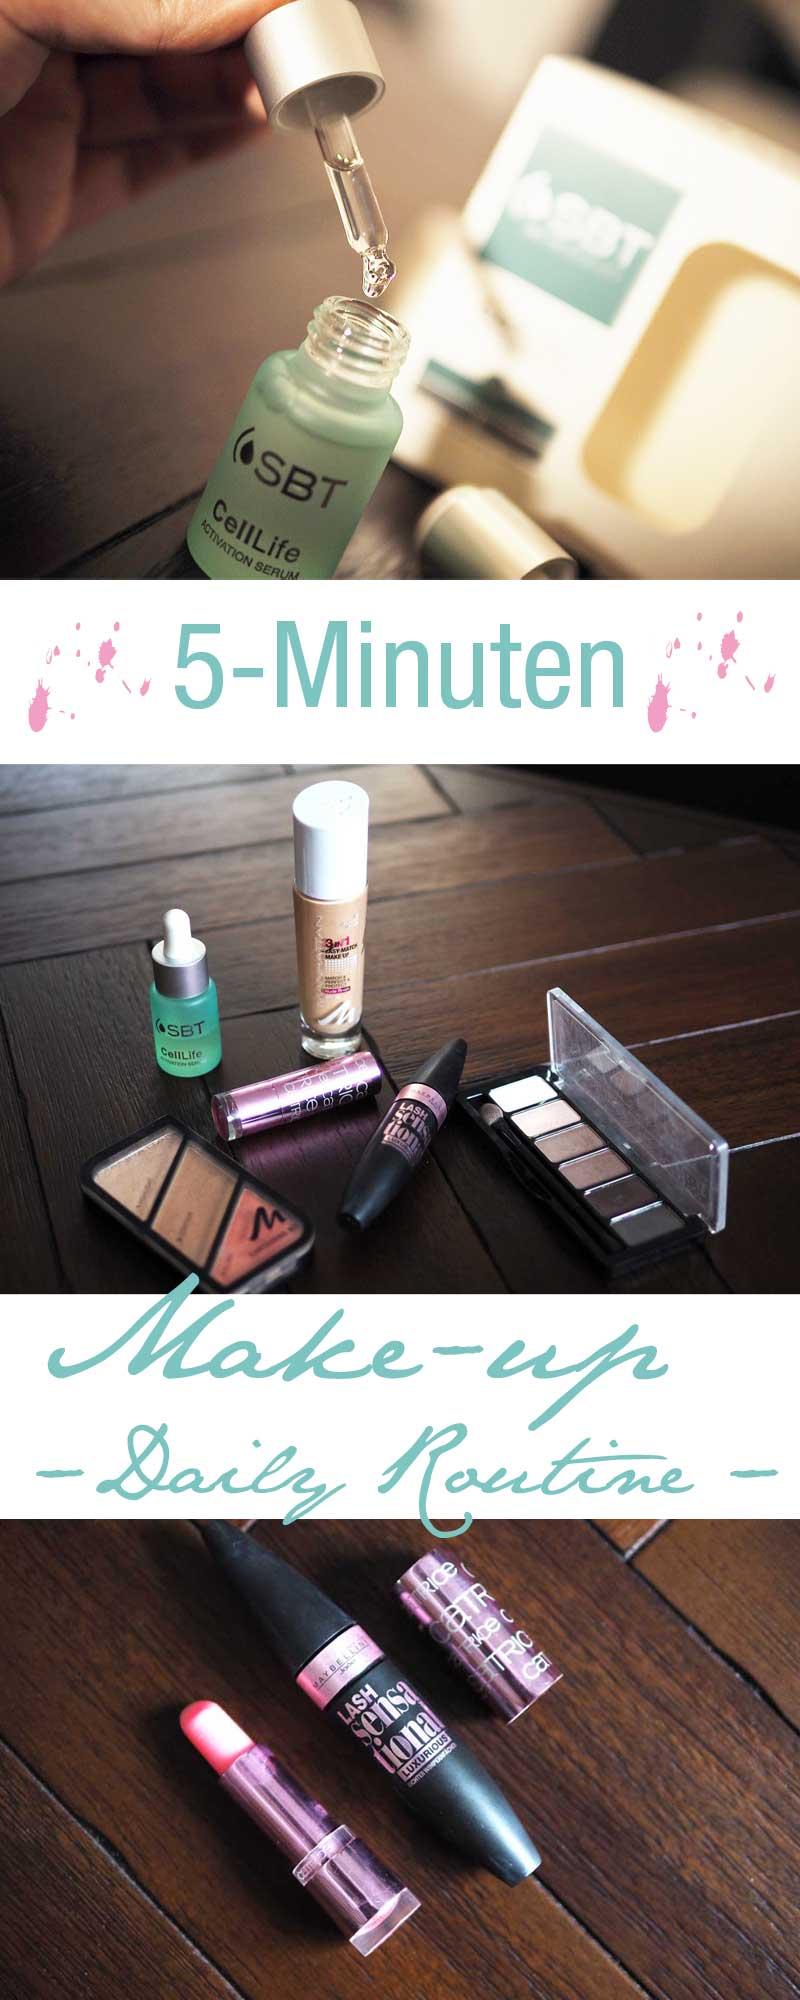 Beauty, Make-up, Make-up Routine, Beautyprodukte, Tages-Make-Up, Serum, Mascara, Rouge, Lippenstift,